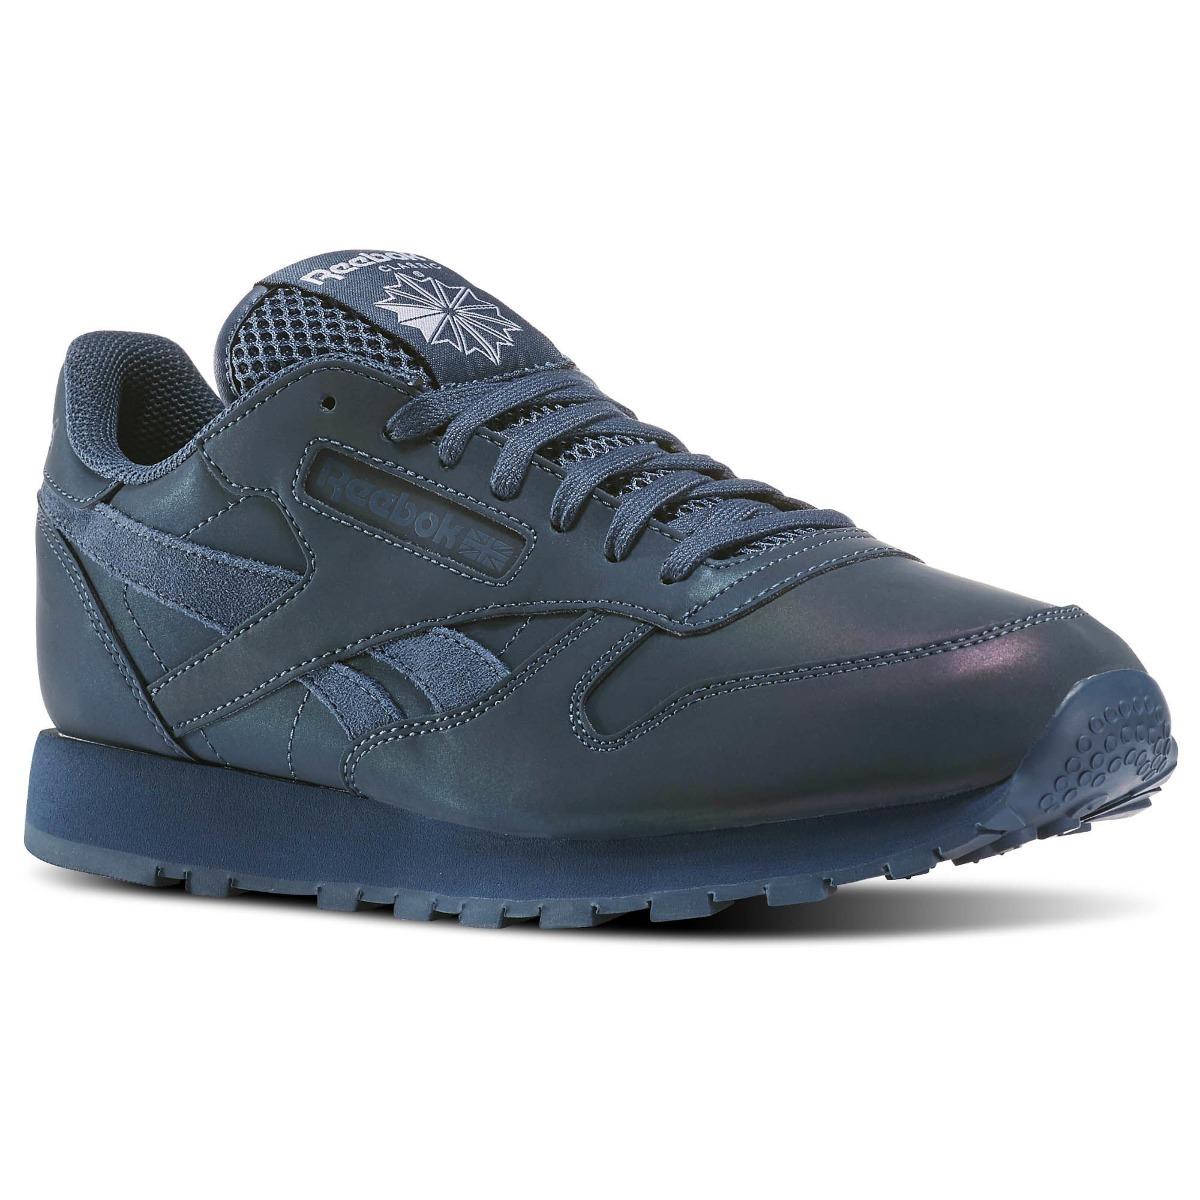 Tenis Reebok Classic Leather Prs Azul Hombres